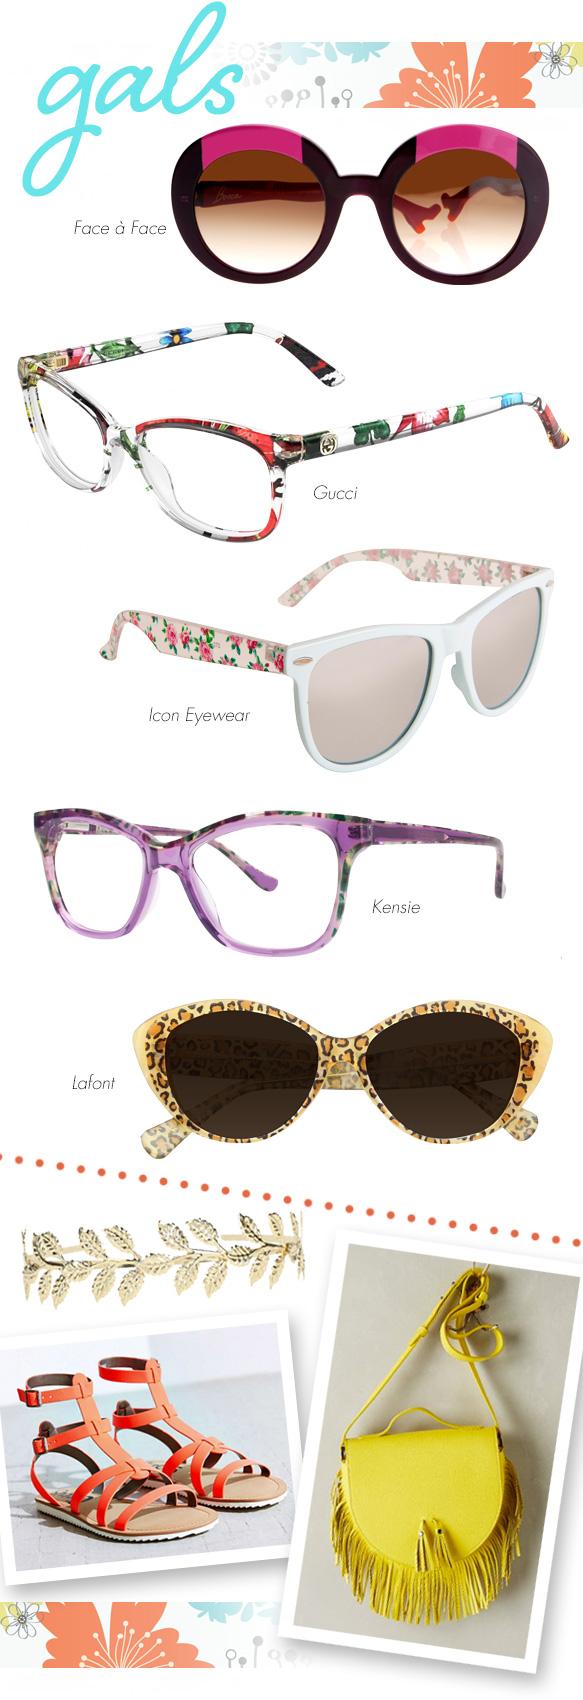 Face à Face (BoccaLova2), Gucci (GG 3699/N), Icon Eyewear (11003), kensie (Downtown), Lafont (PORQUEROLLES)